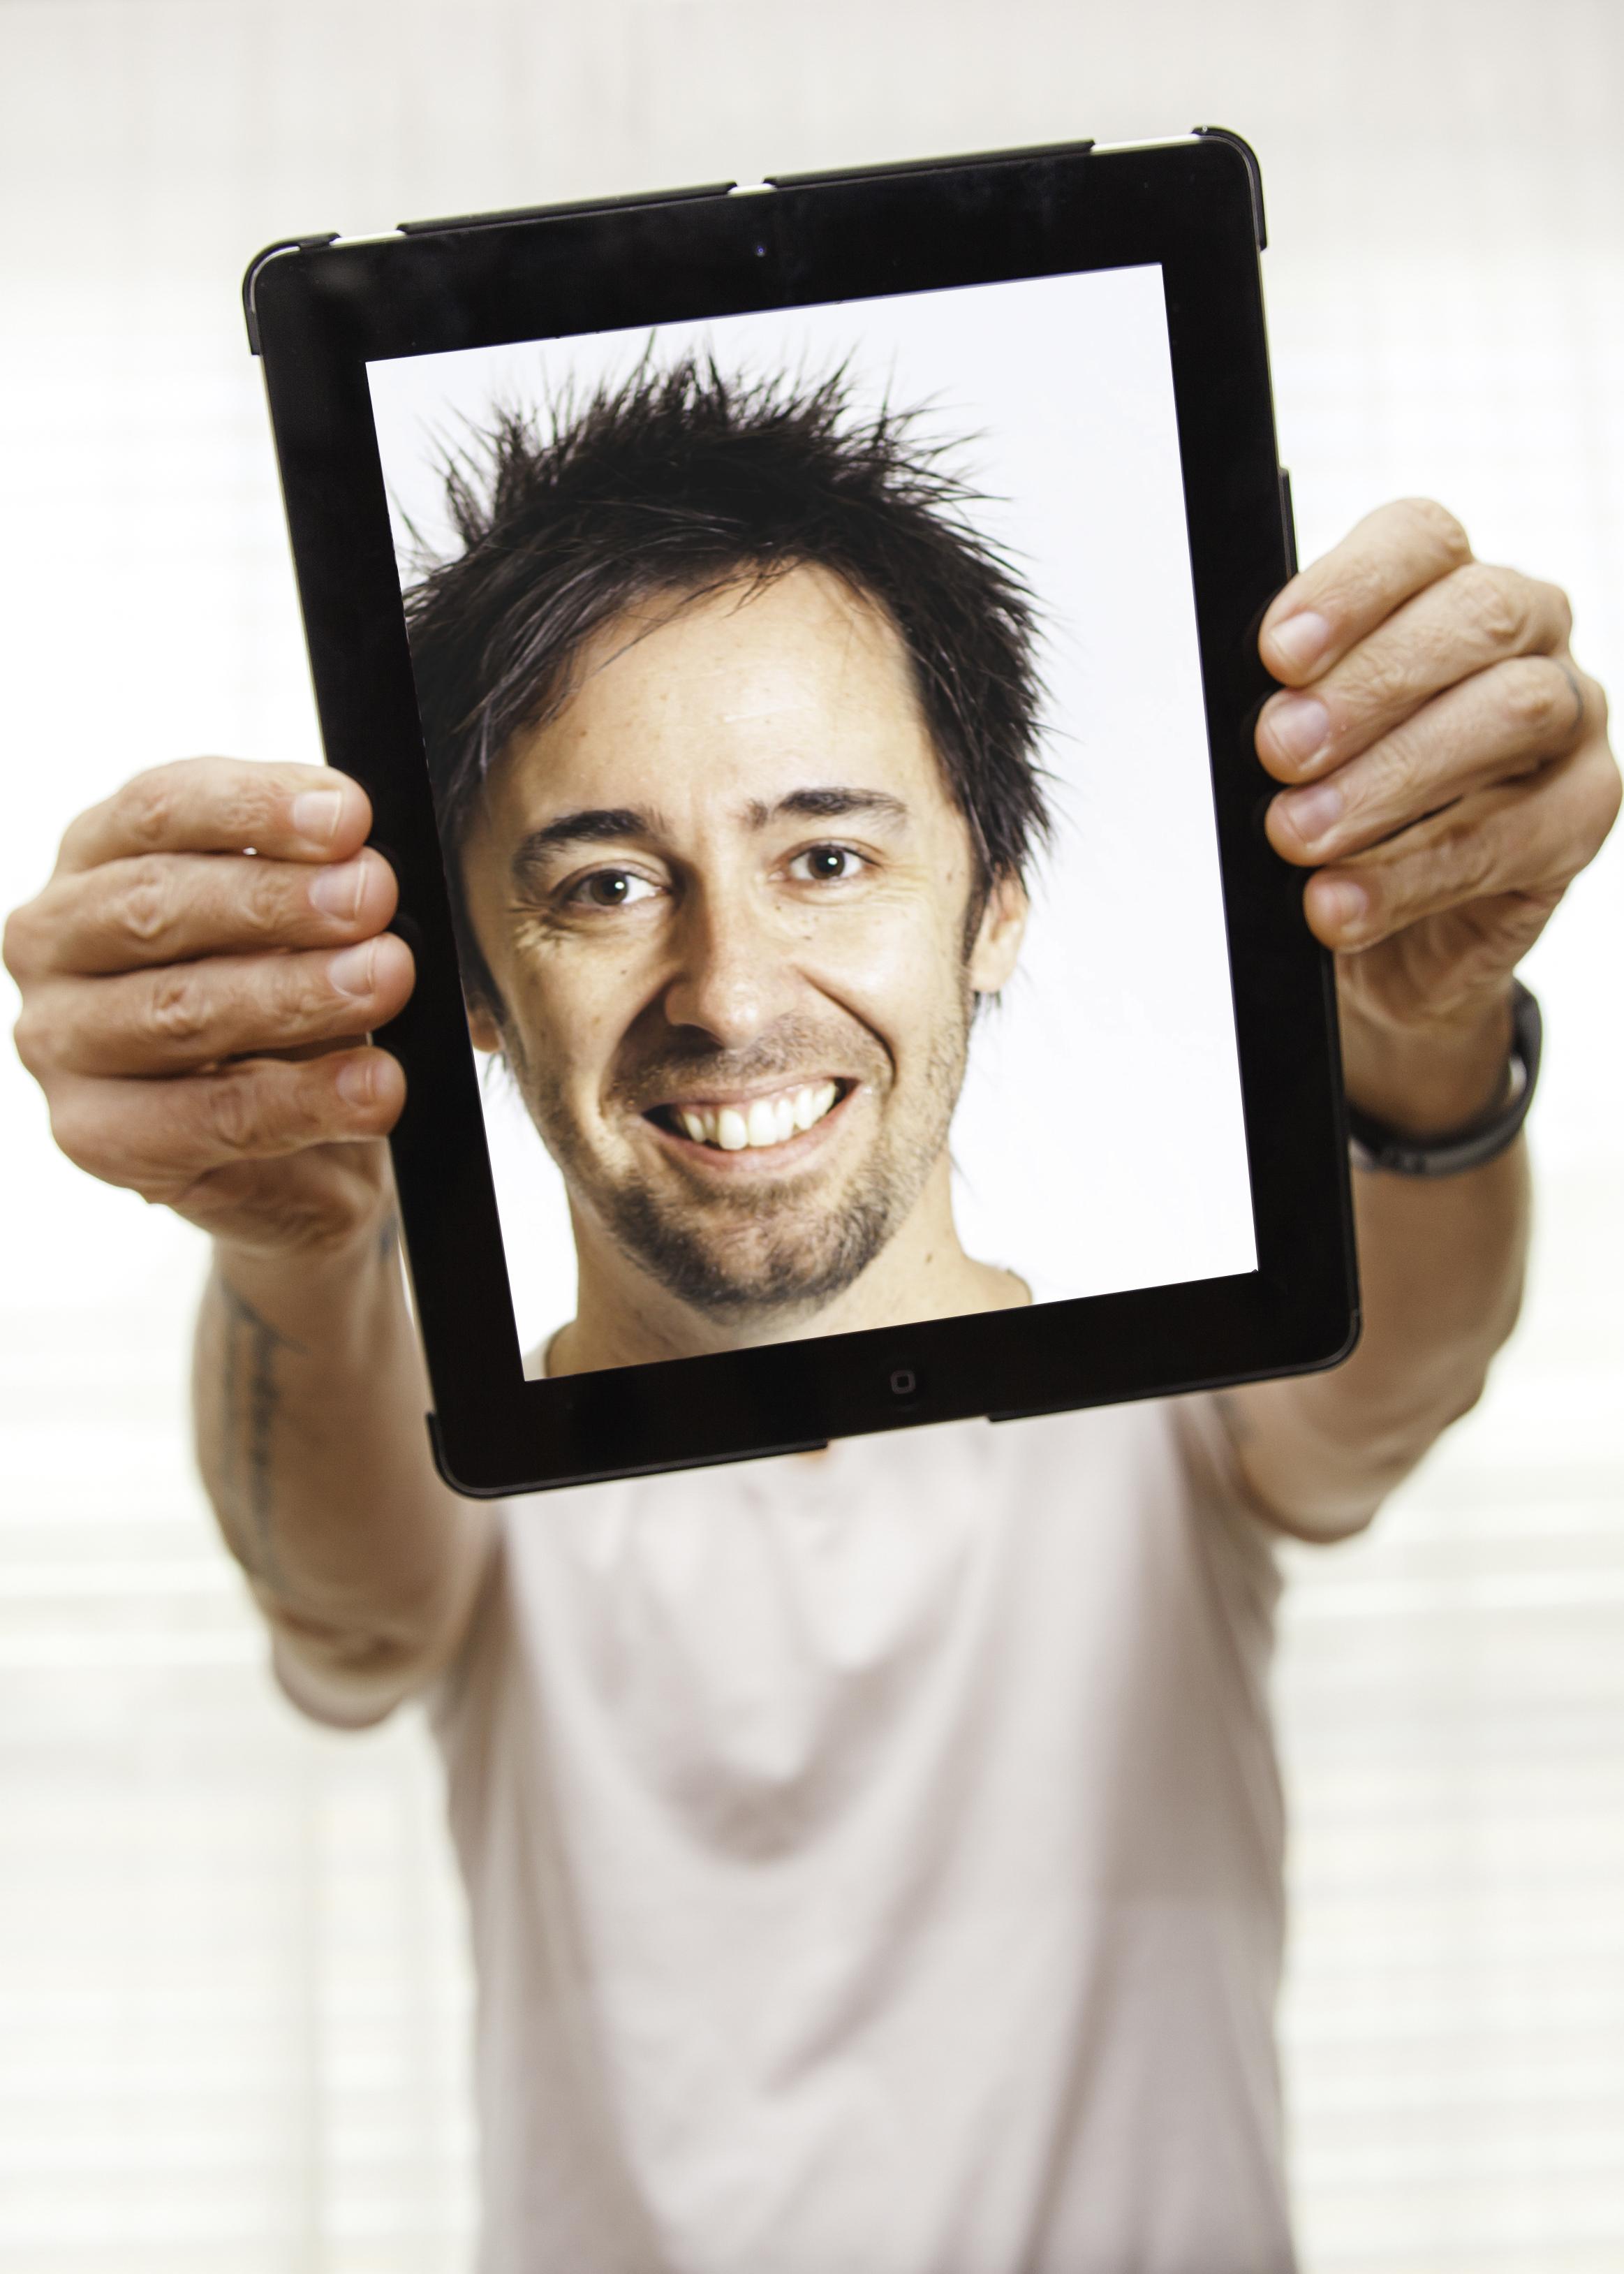 050116_Selfie_Self_portrait4019 copy.jpg